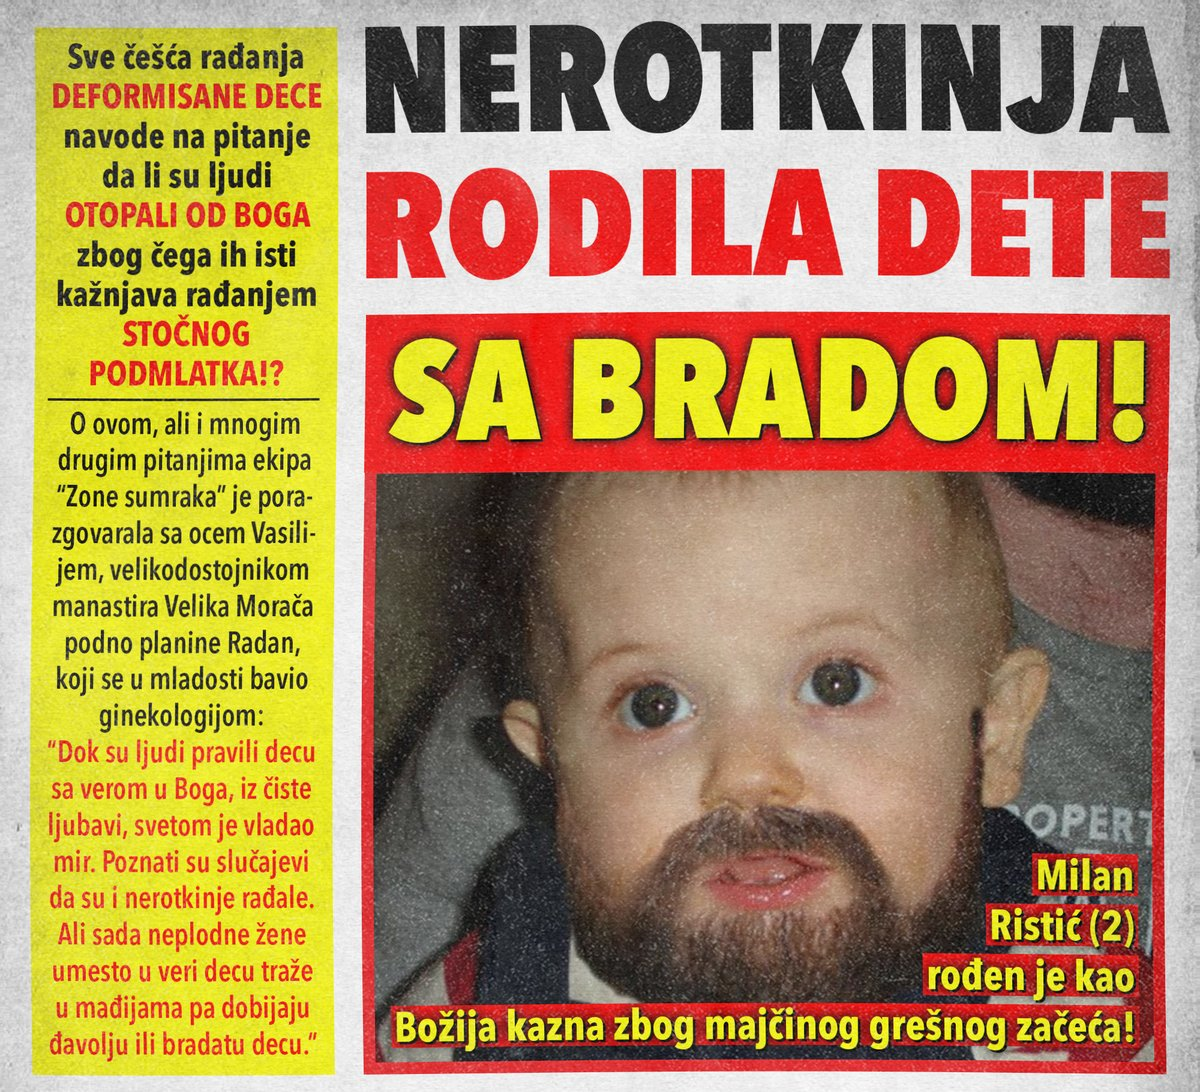 Nerotkinja rodila dete sa bradom